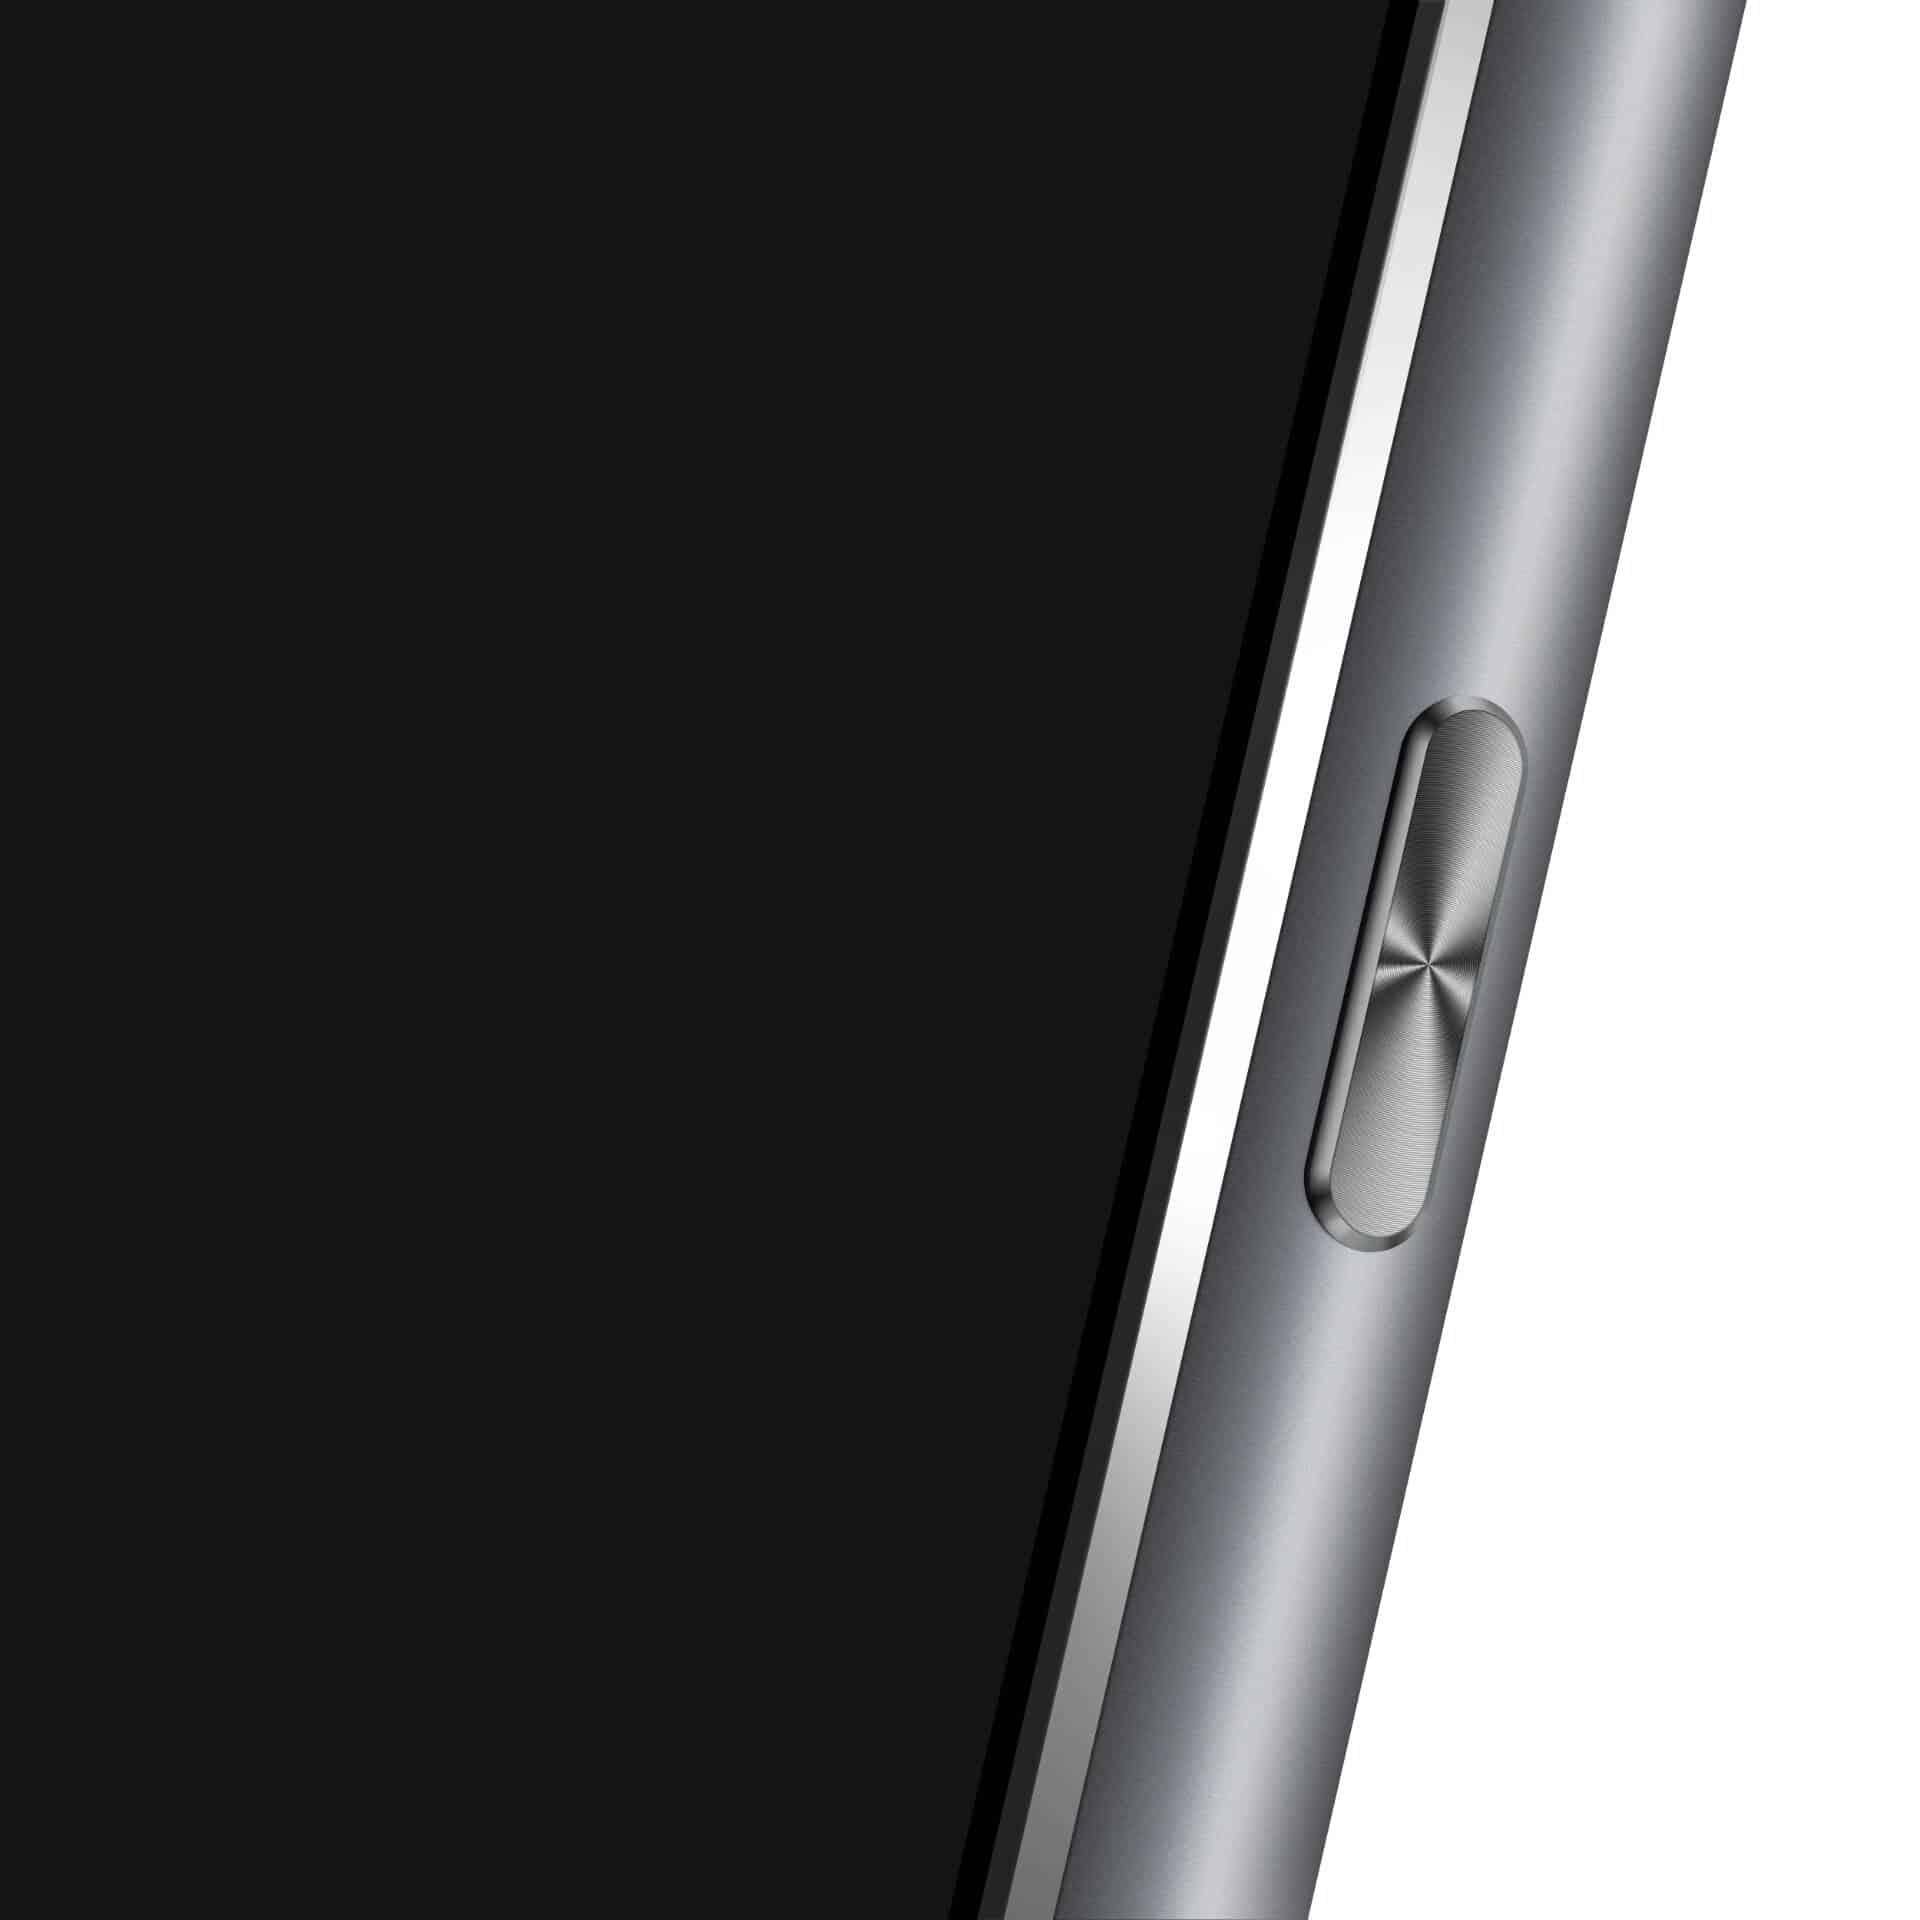 ASUS ZenFone 3 Ultra 23